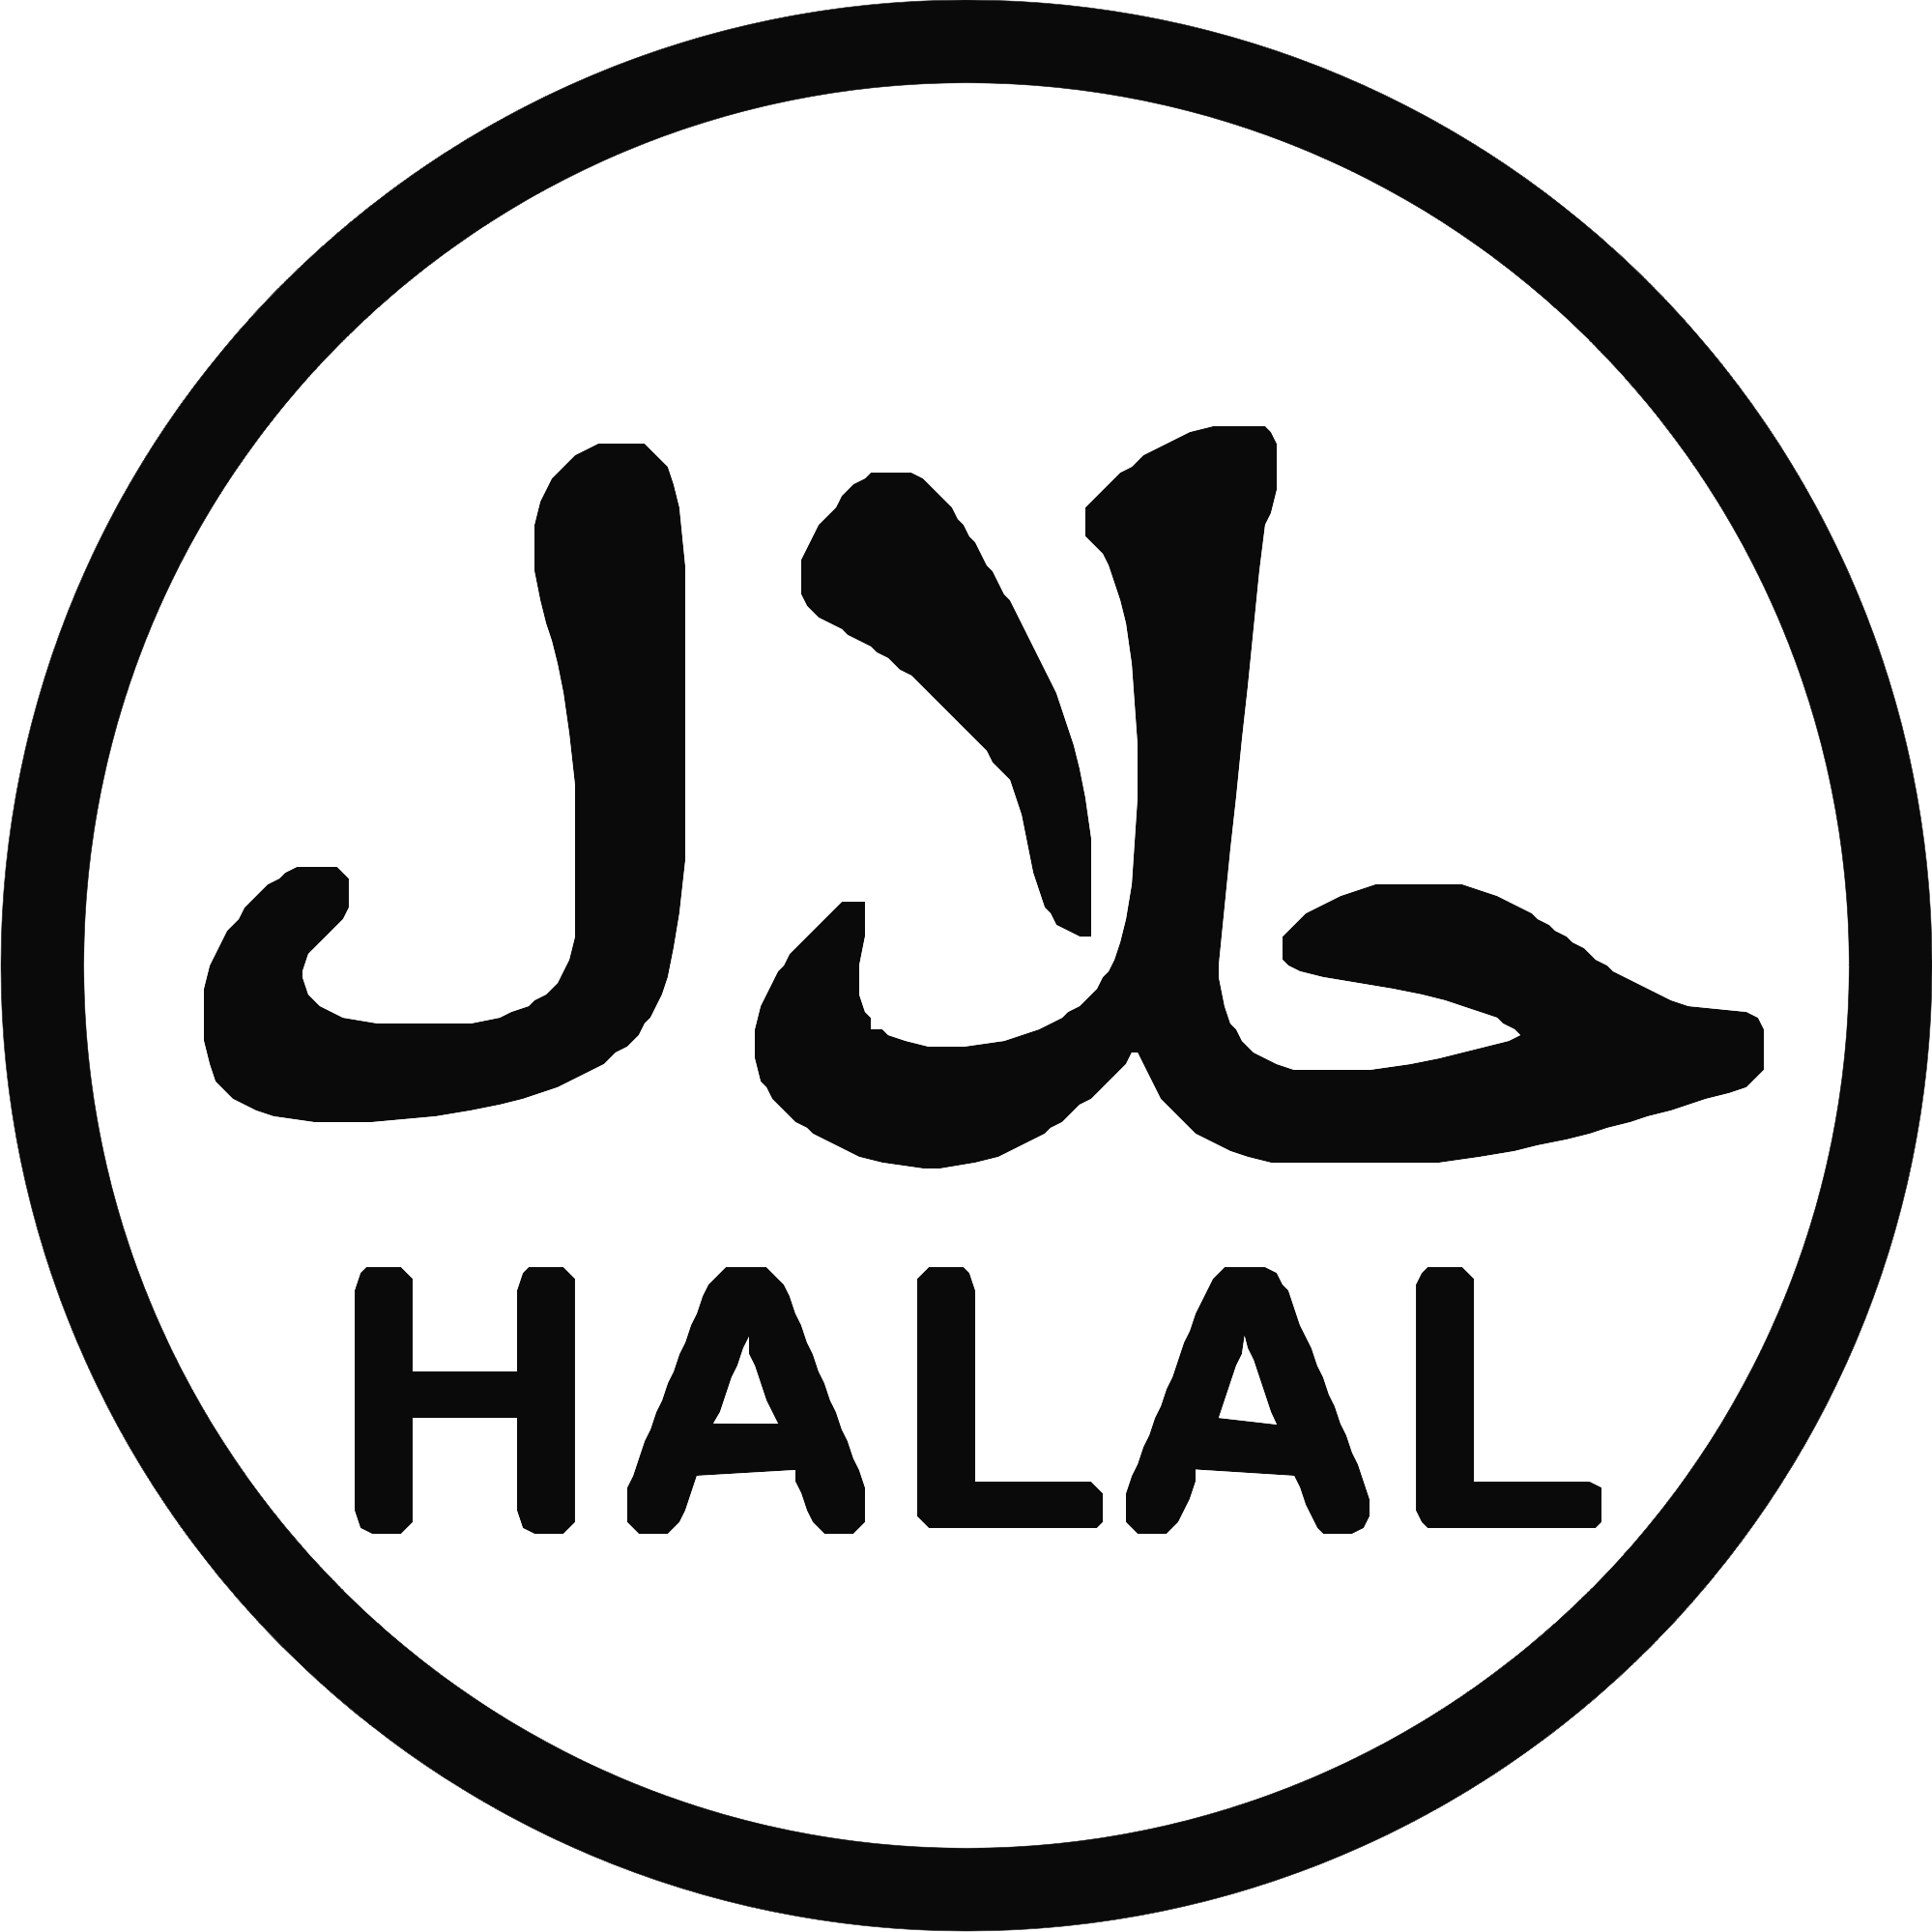 HALAL Logo Wallpaper